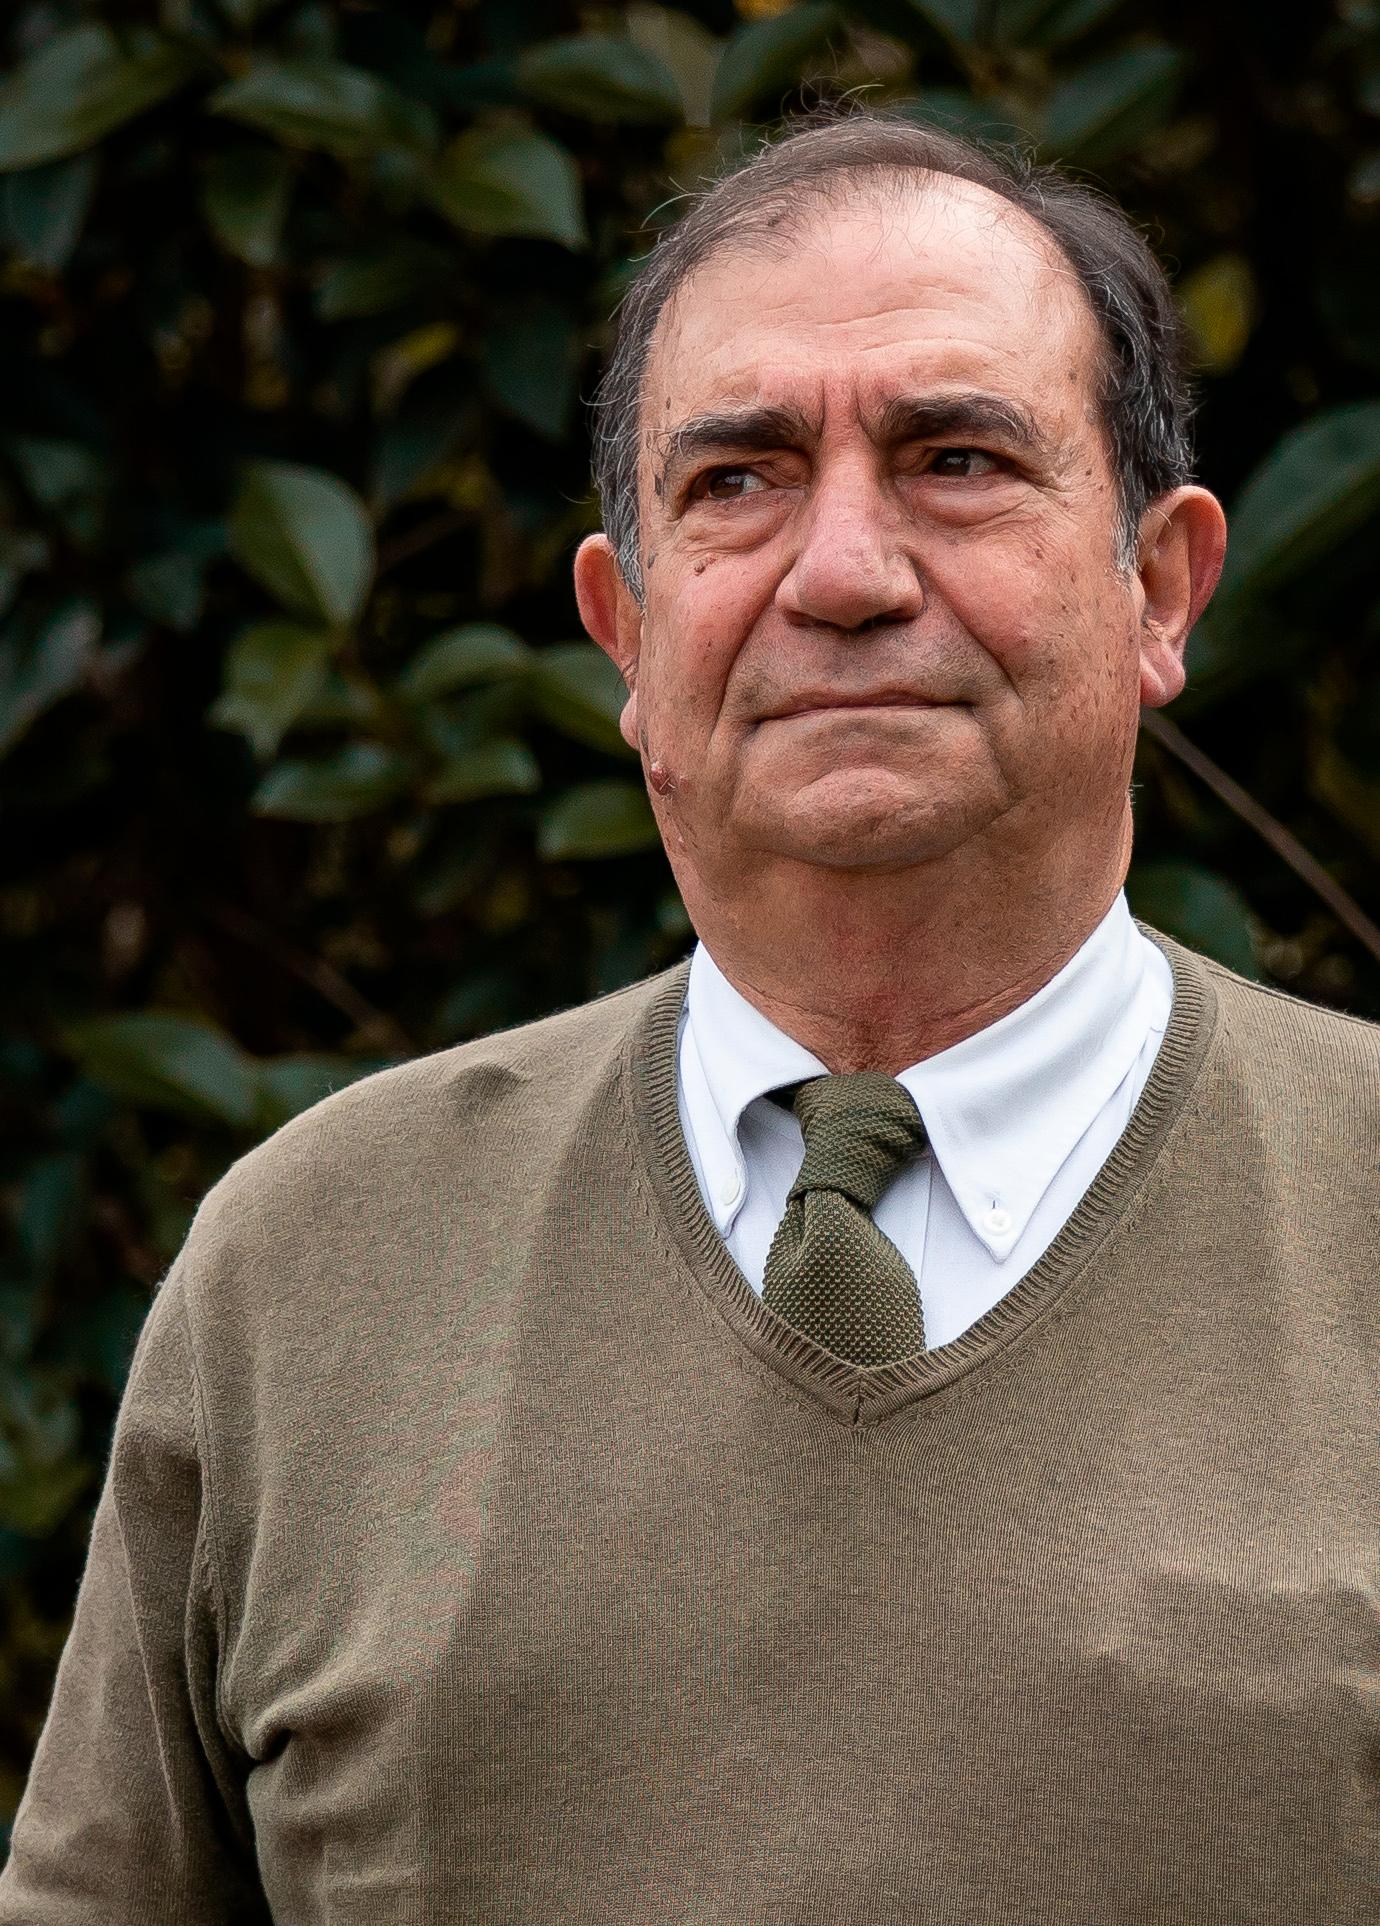 José-Costa-Ferreira